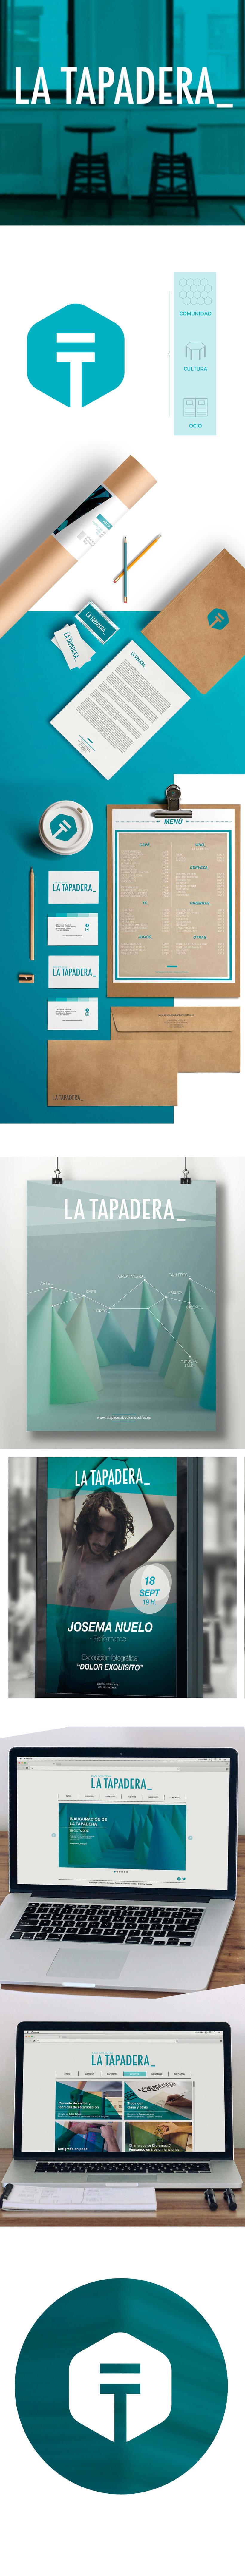 La Tapadera -1